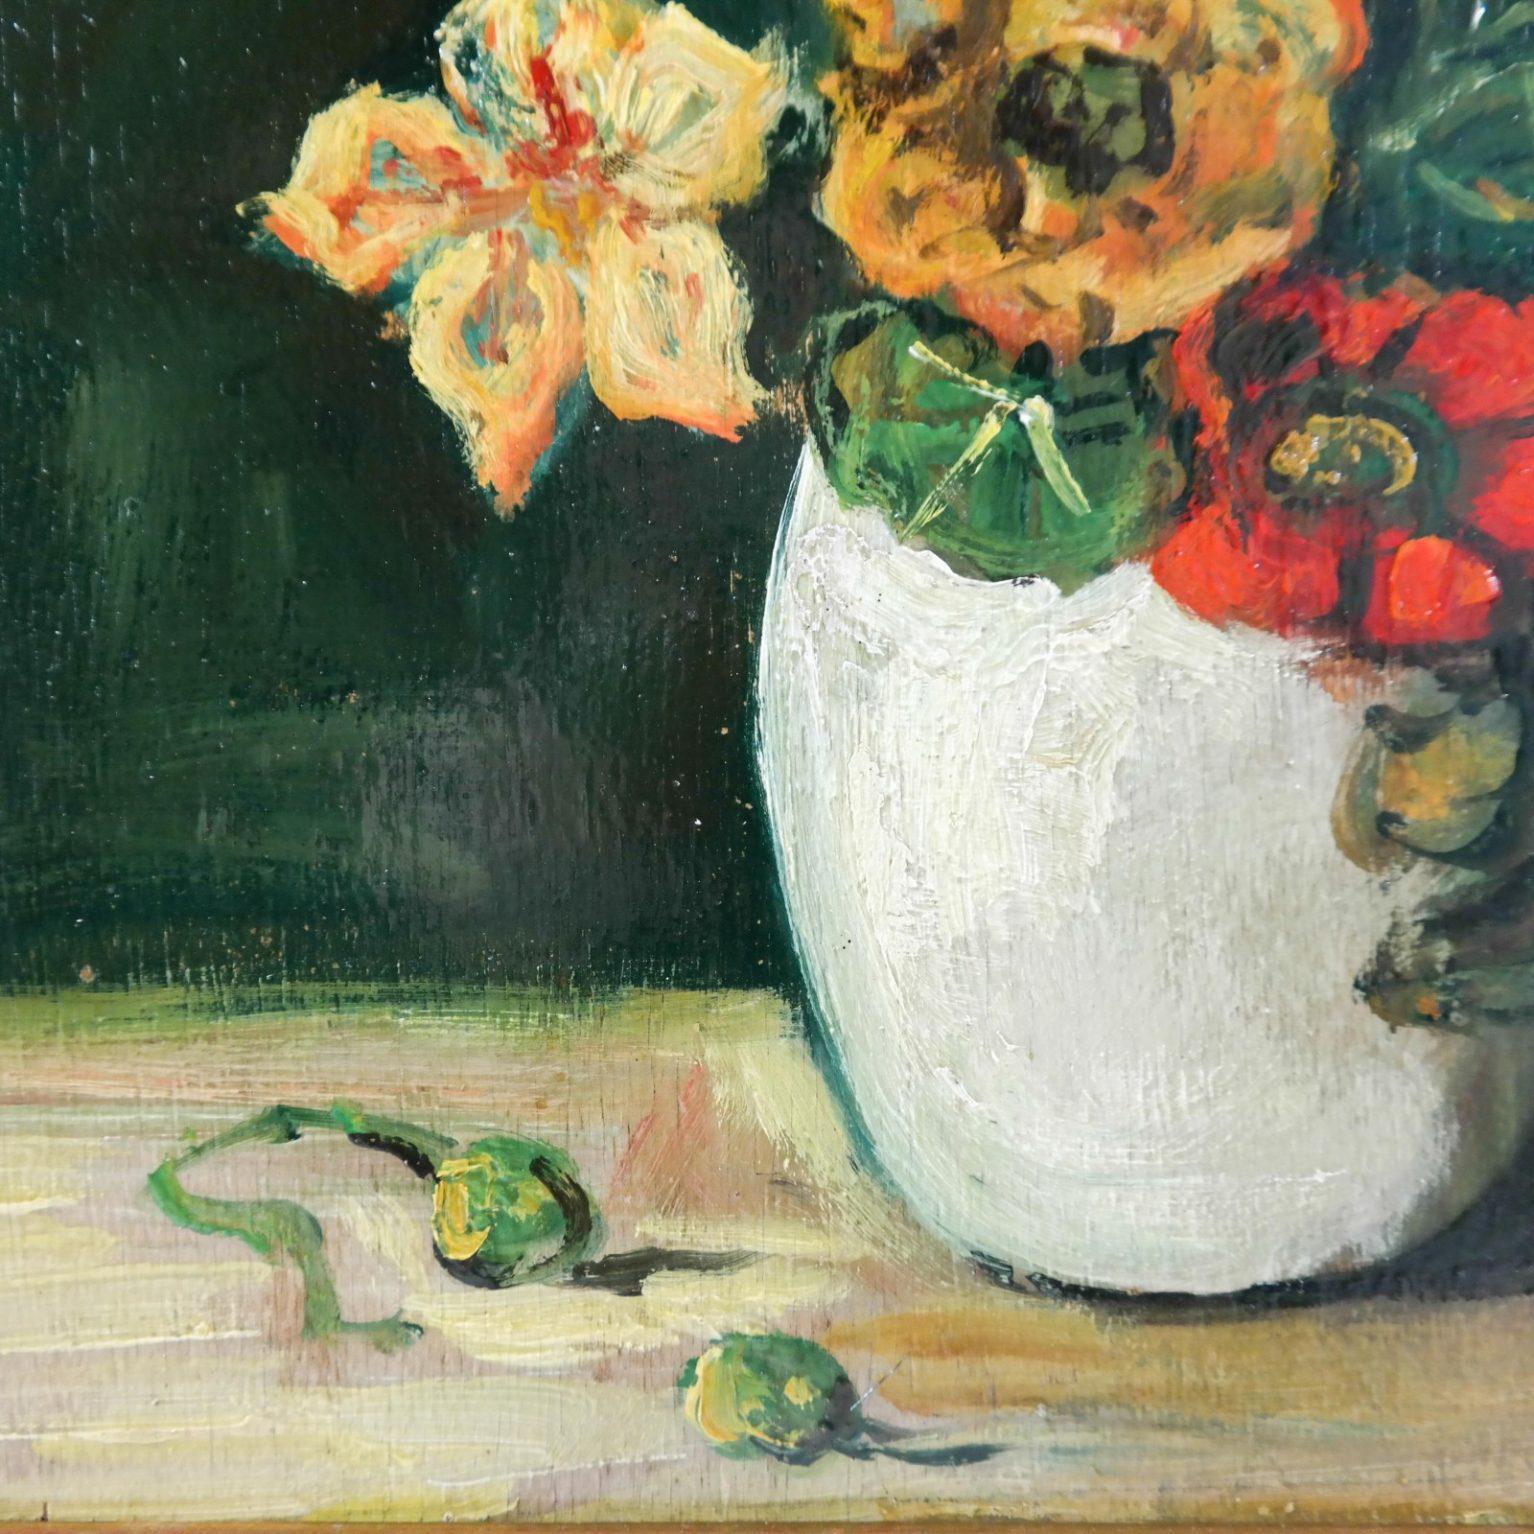 Dirk Filarski (1885-1964) - Bloemstilleven